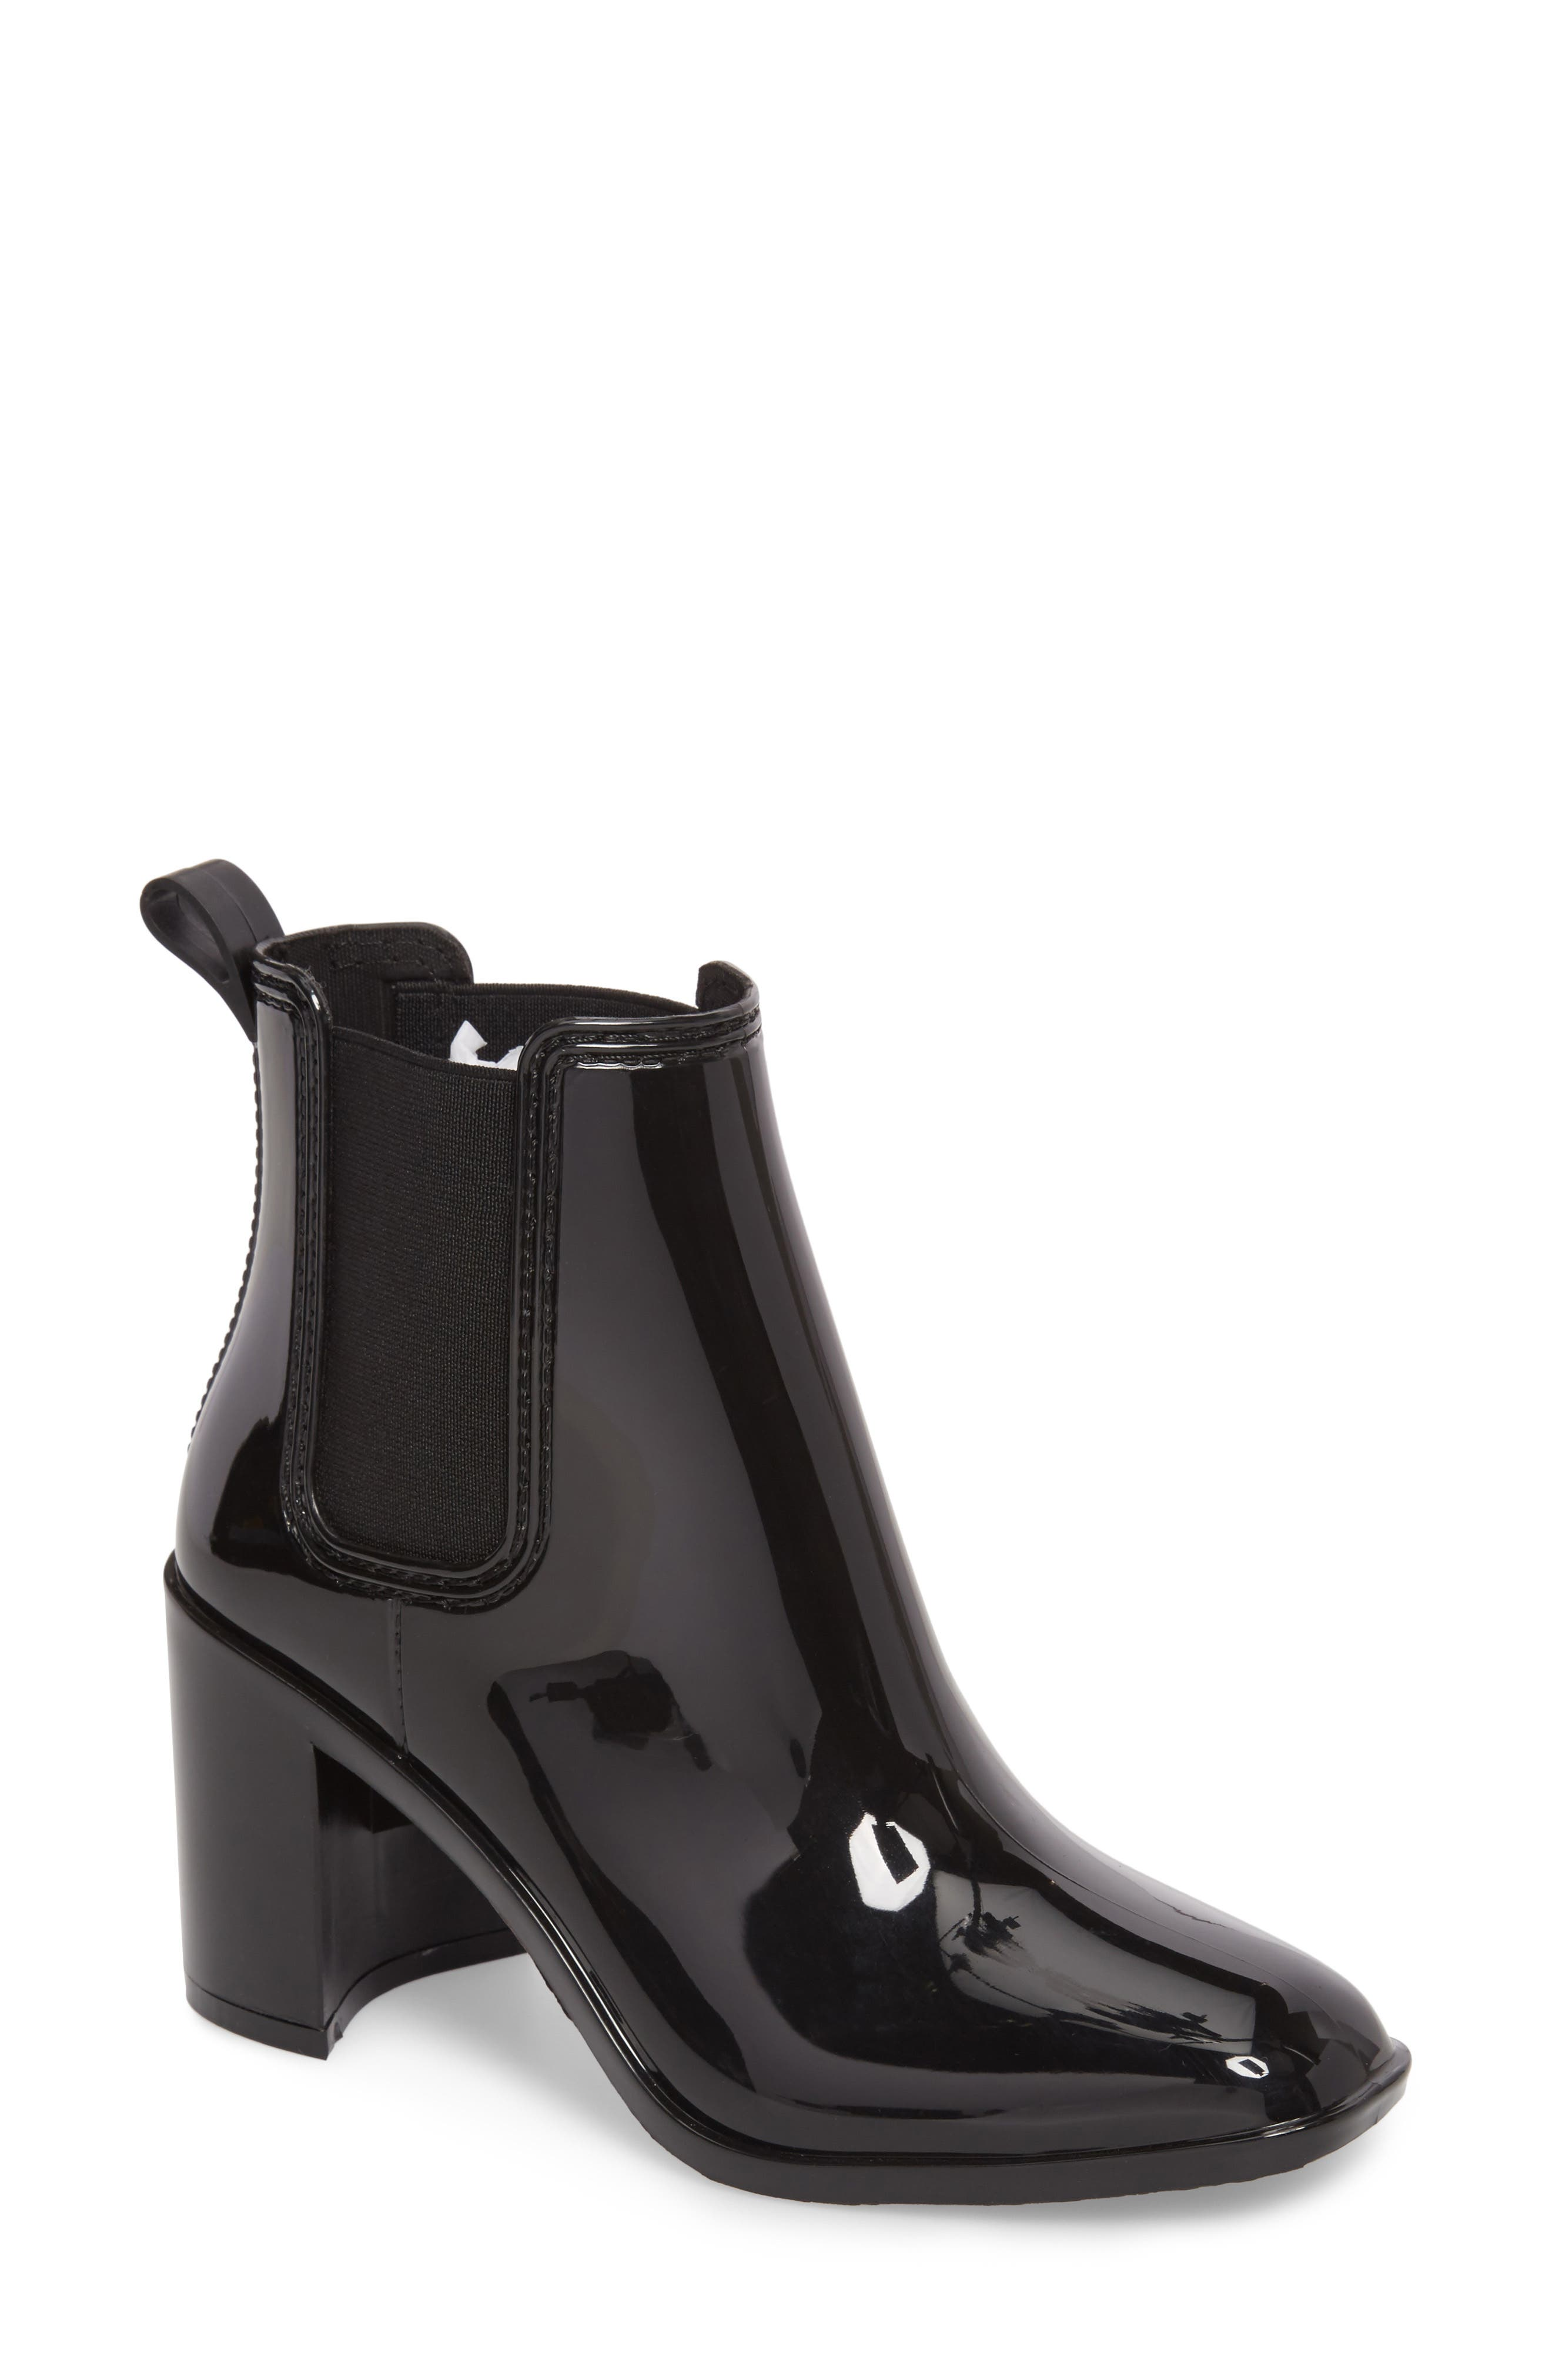 Hurricane Waterproof Boot,                             Main thumbnail 1, color,                             BLACK